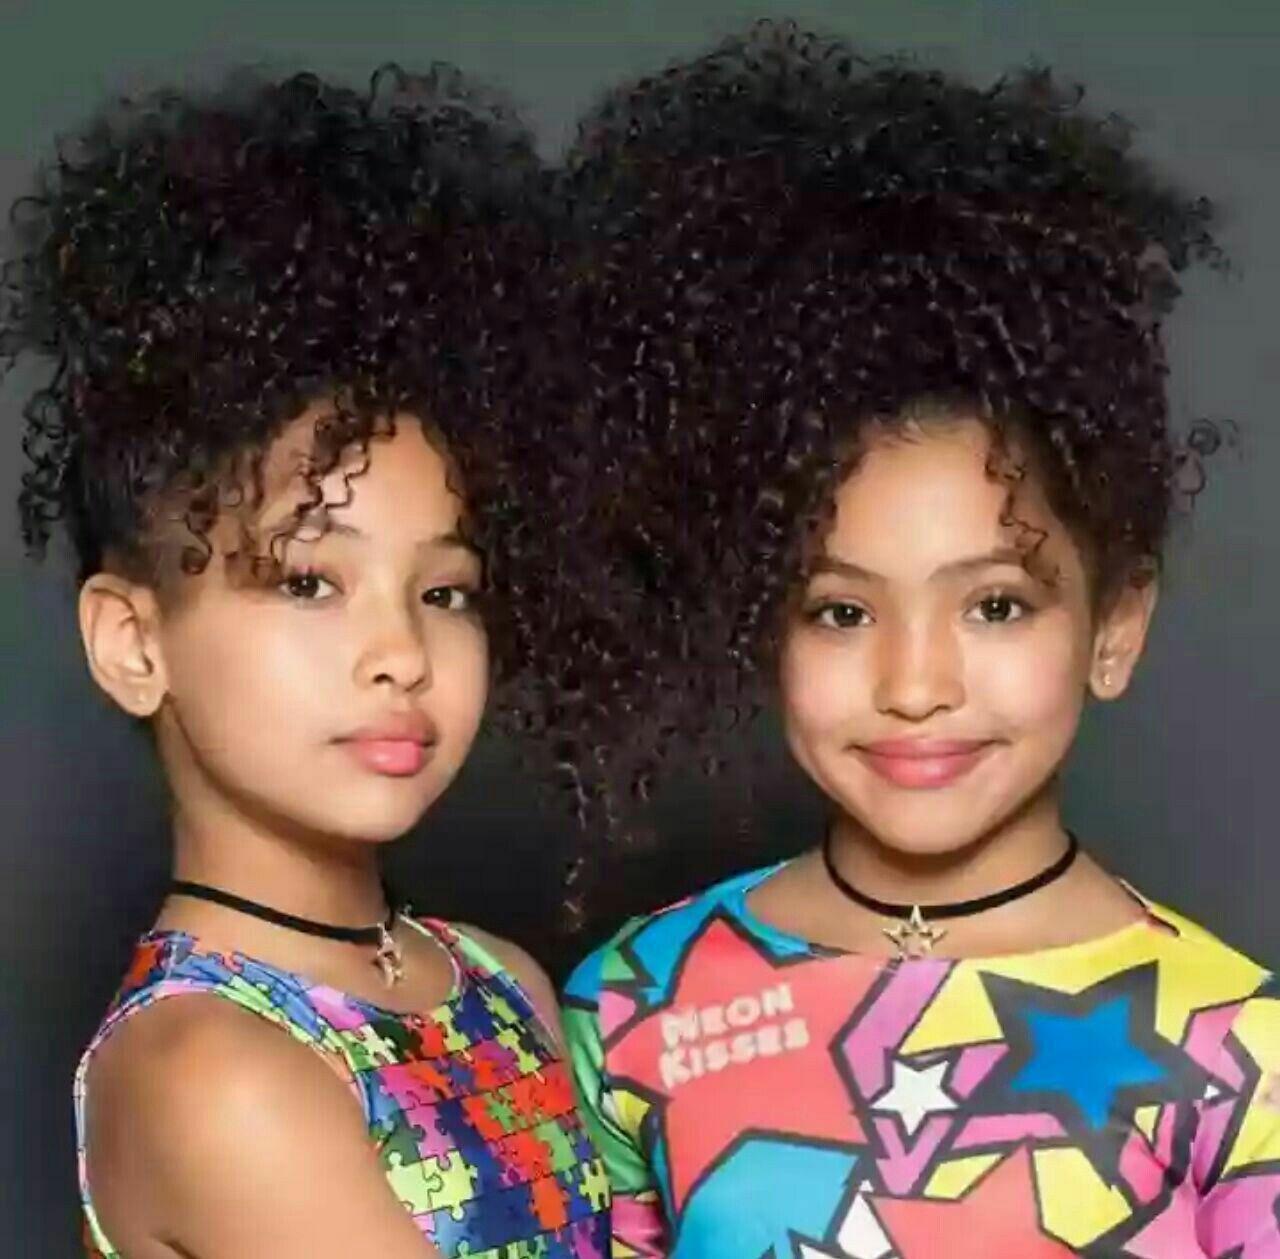 slaythemall17 kids cute